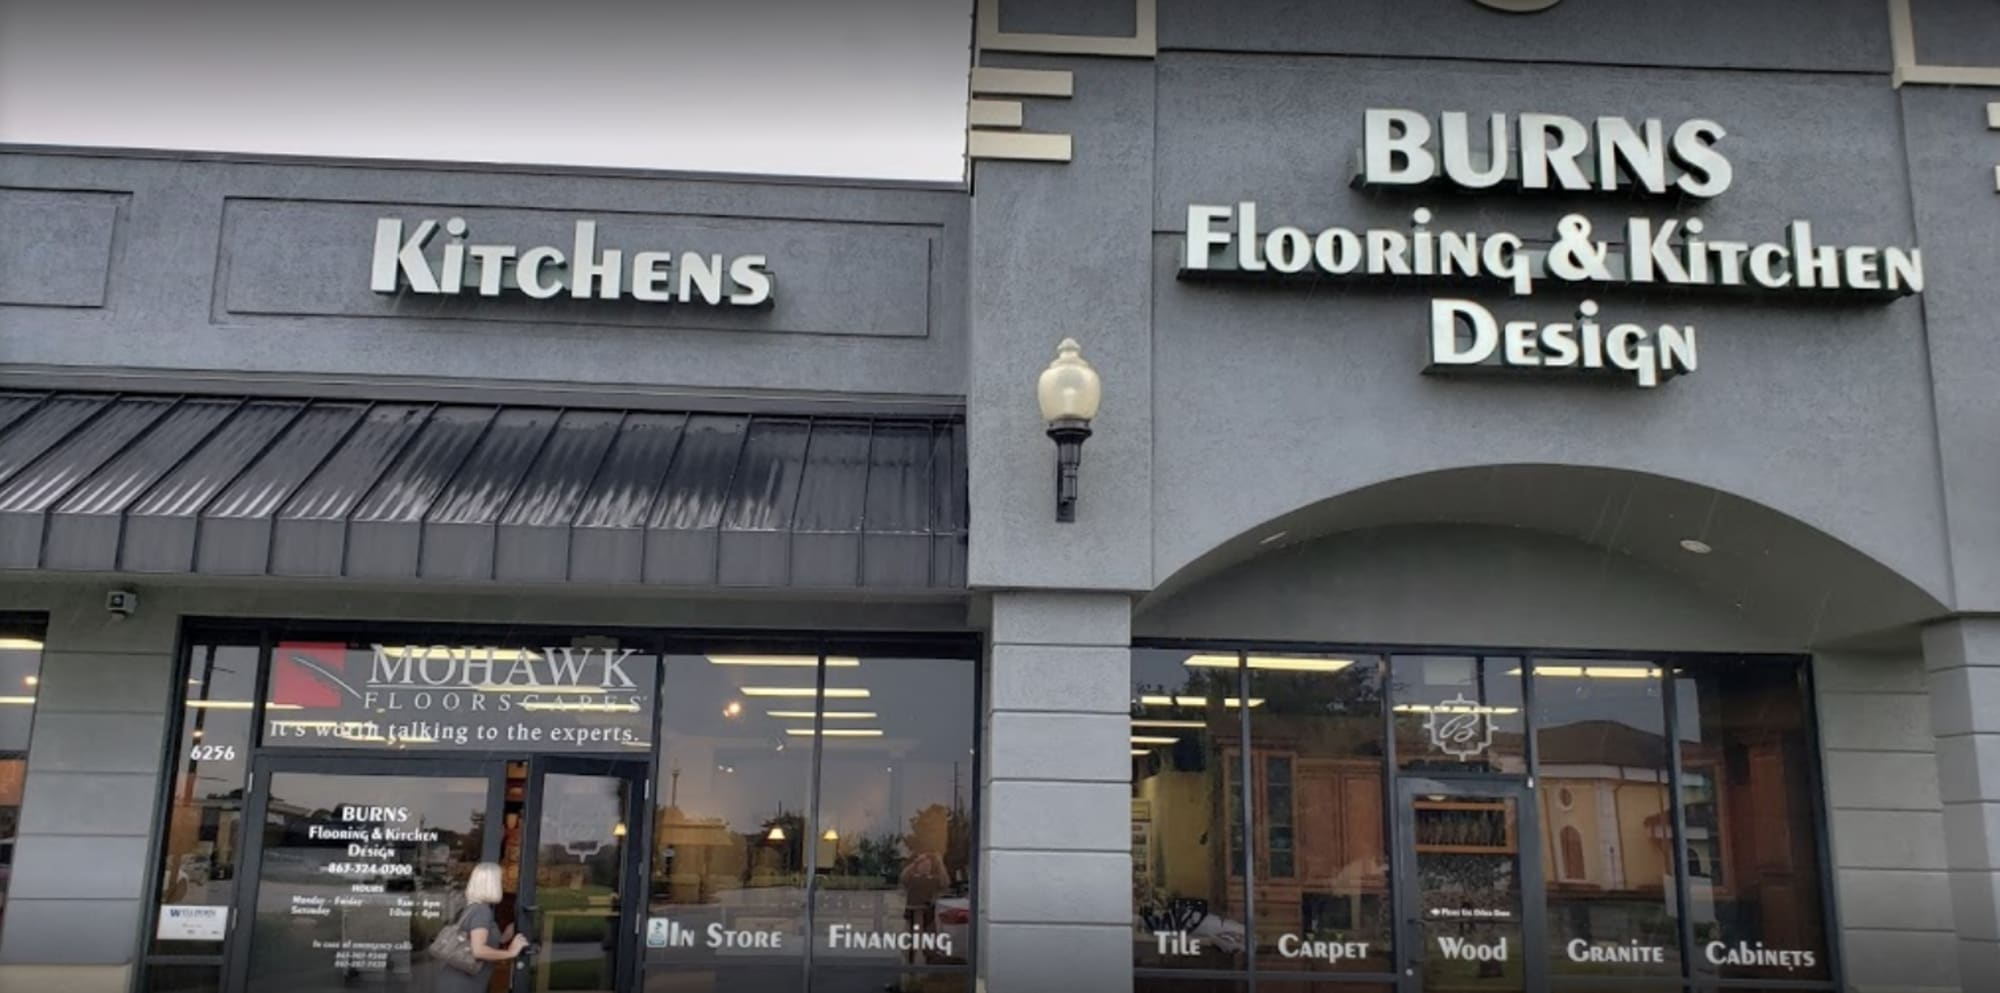 Burns Flooring & Design - 10 Spirit Lake Rd Winter Haven, FL 33880